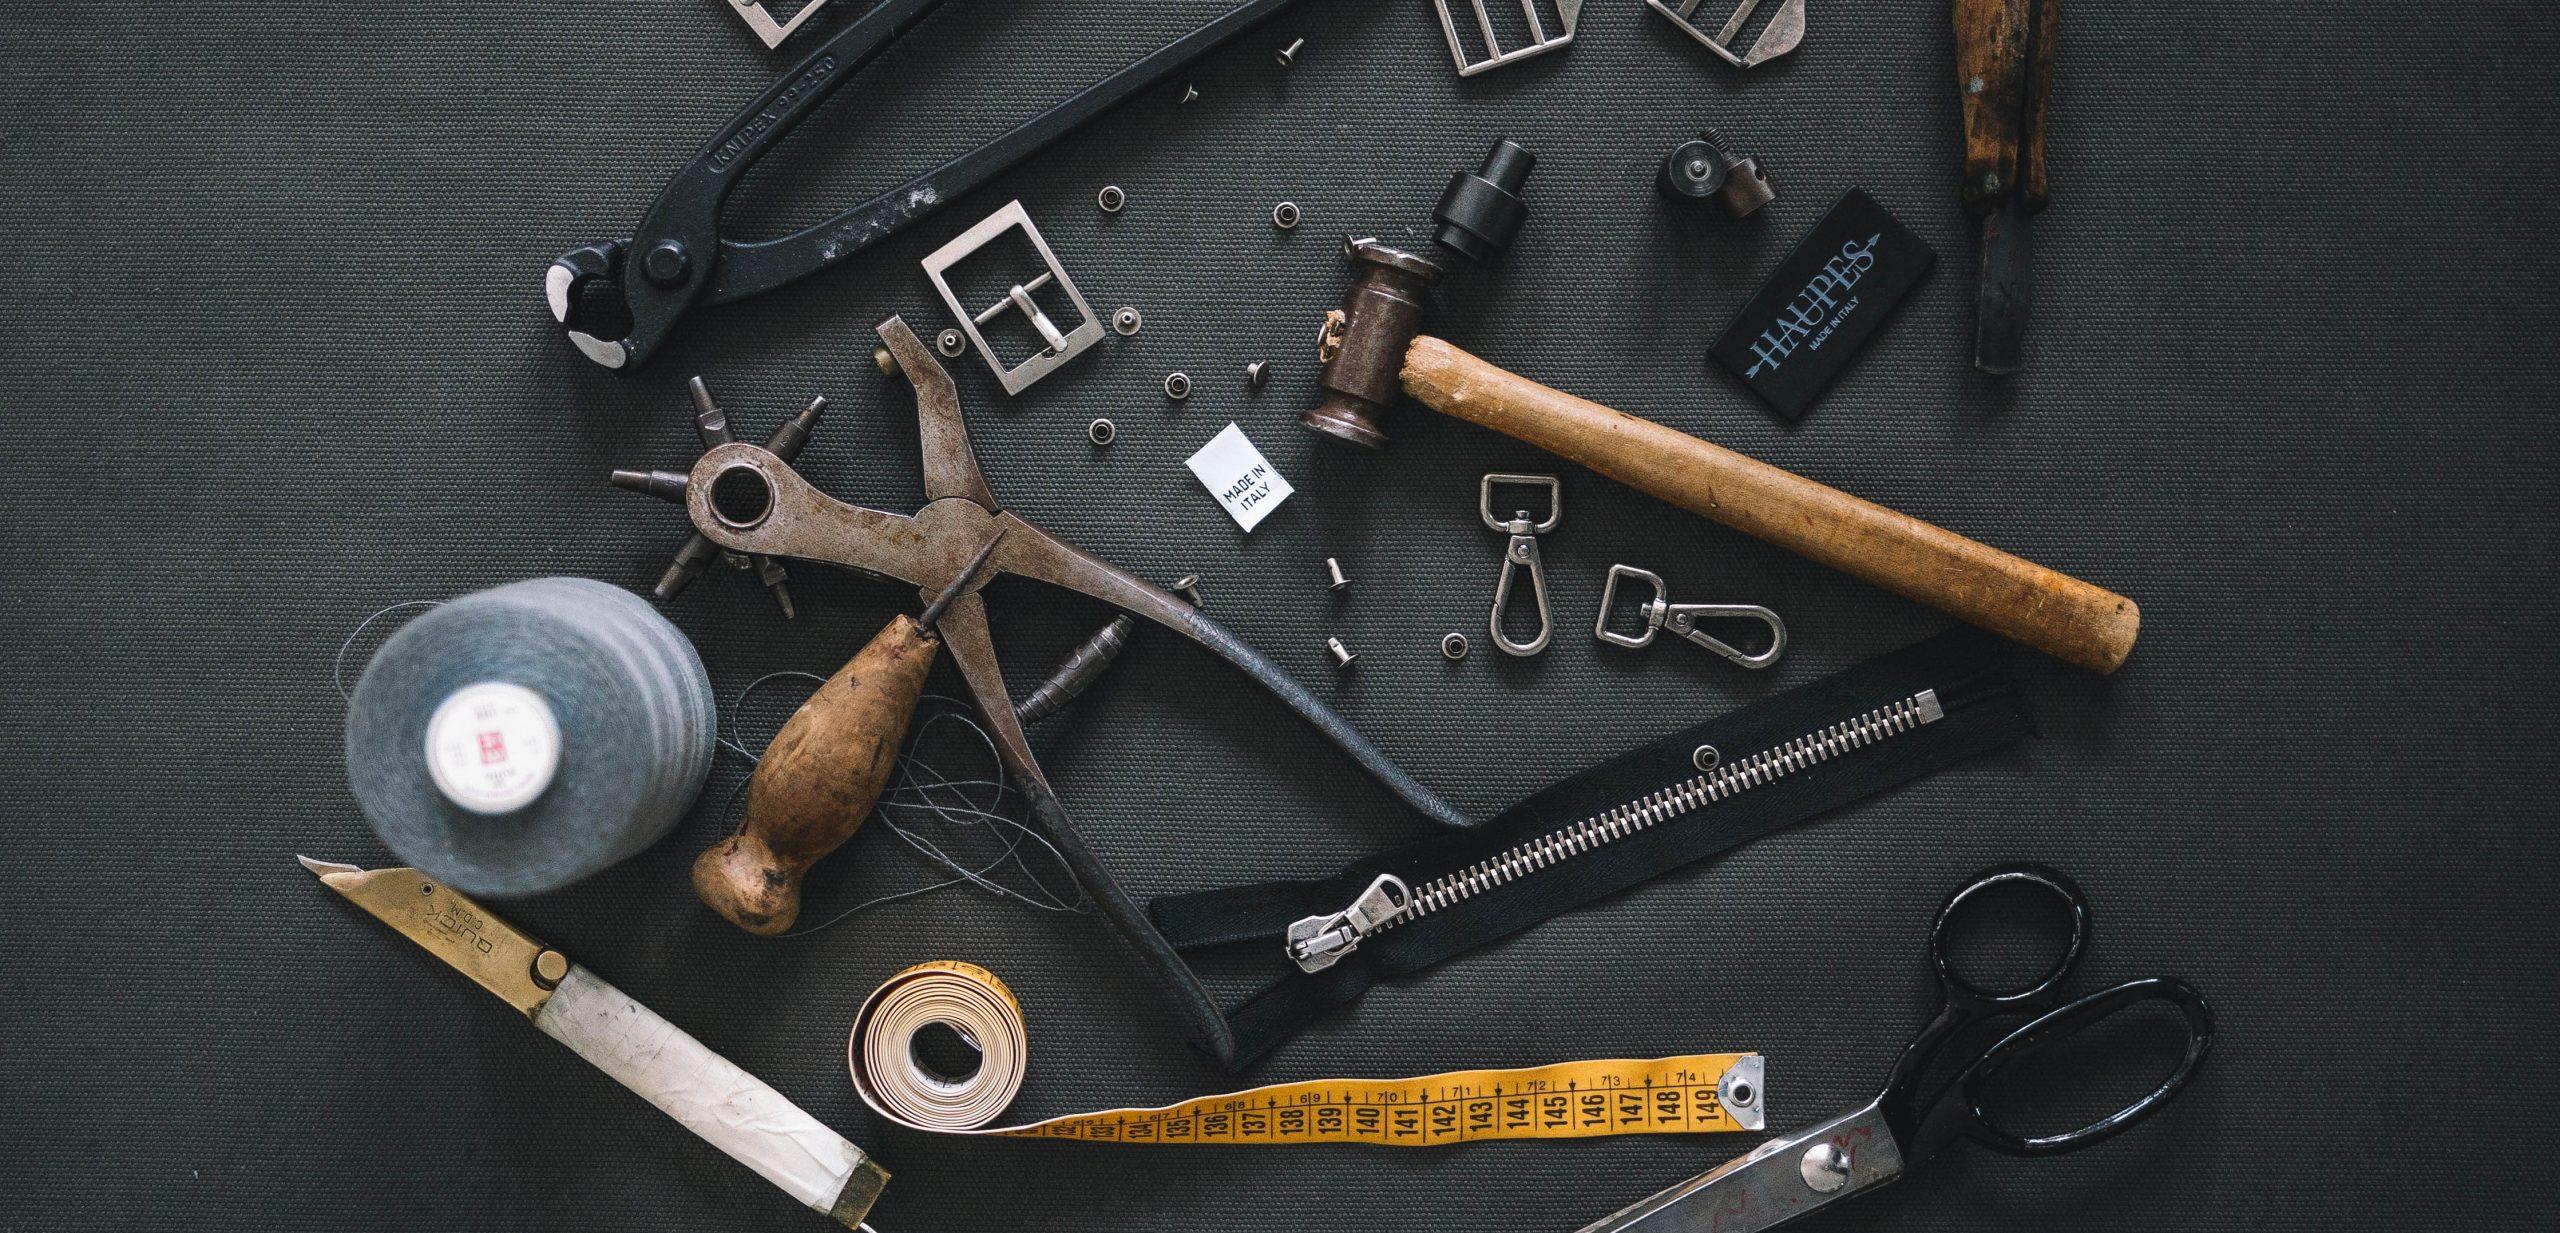 Bild på gamla verktyg. Foto: Haupes / Unsplash